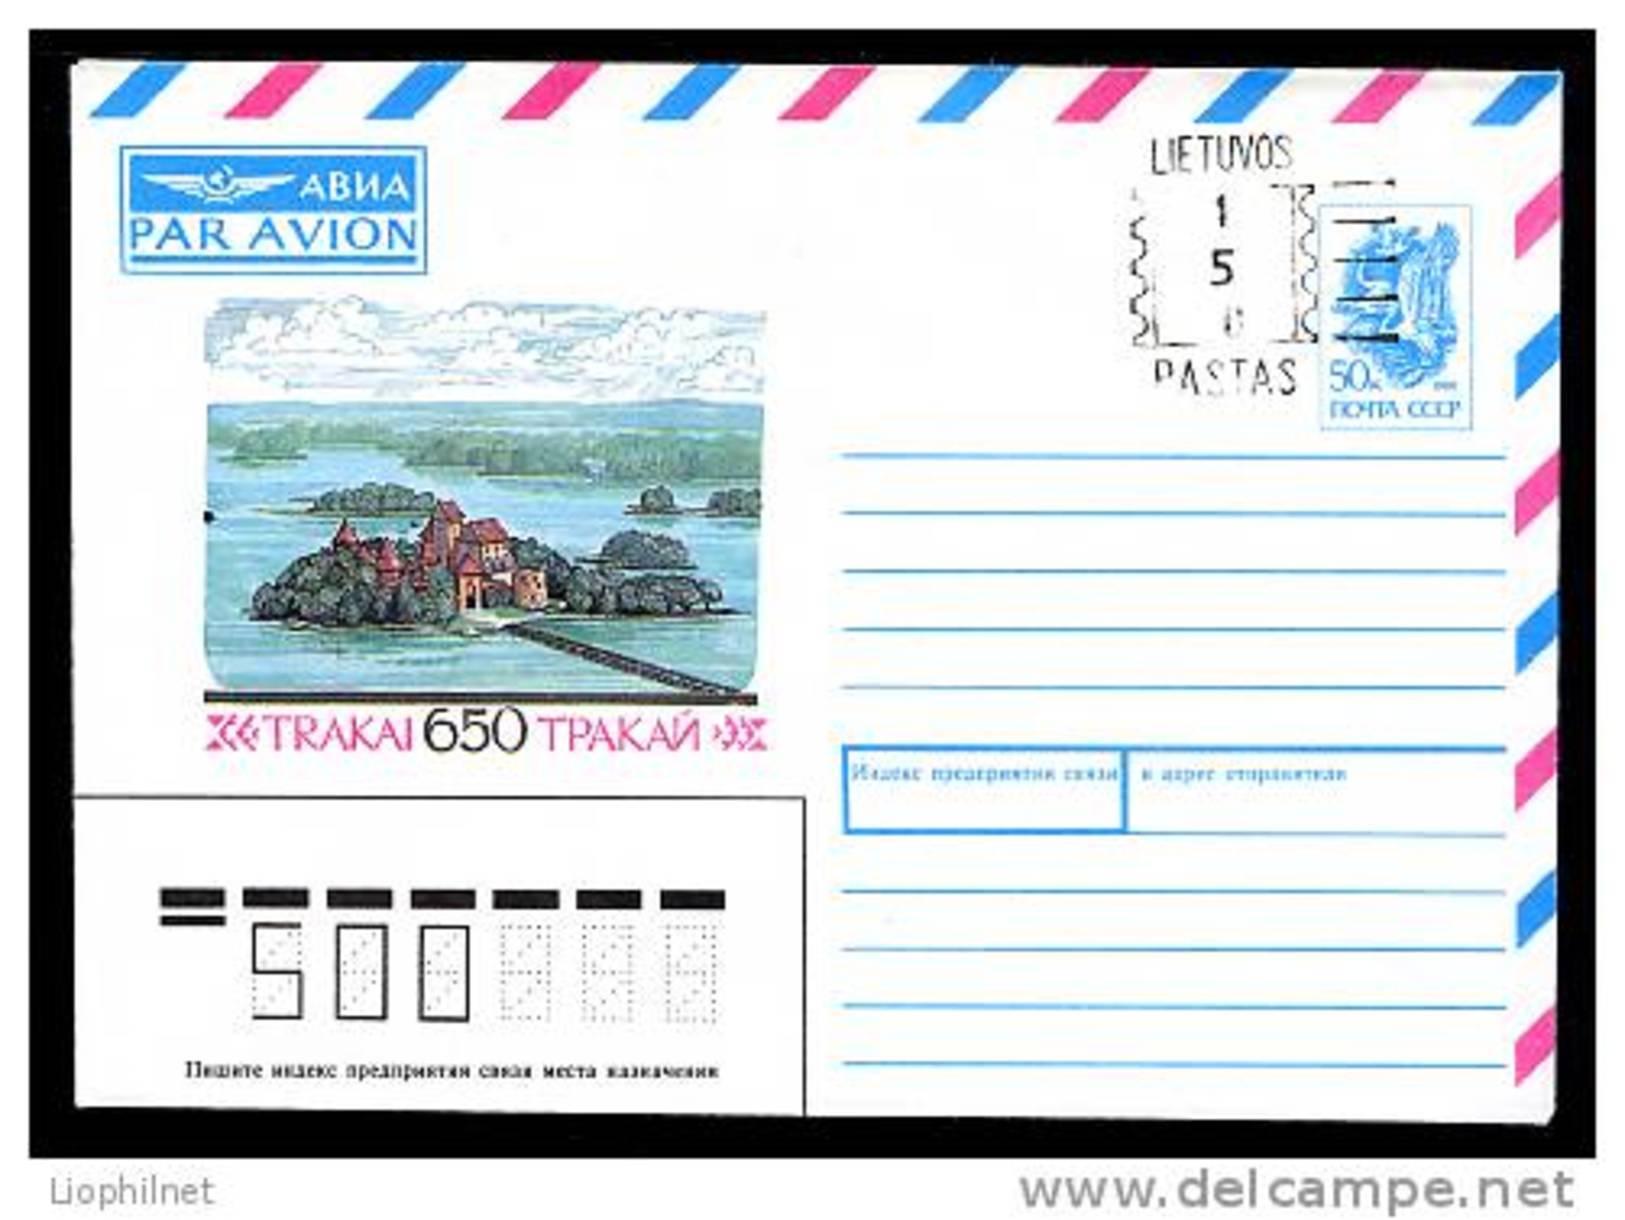 LITUANIE 1992,  ENTIER POSTAL TRAKAI URSS SURCHARGE 150 ,  1 Enveloppe, Neuve / Mint.  R430 - Litauen